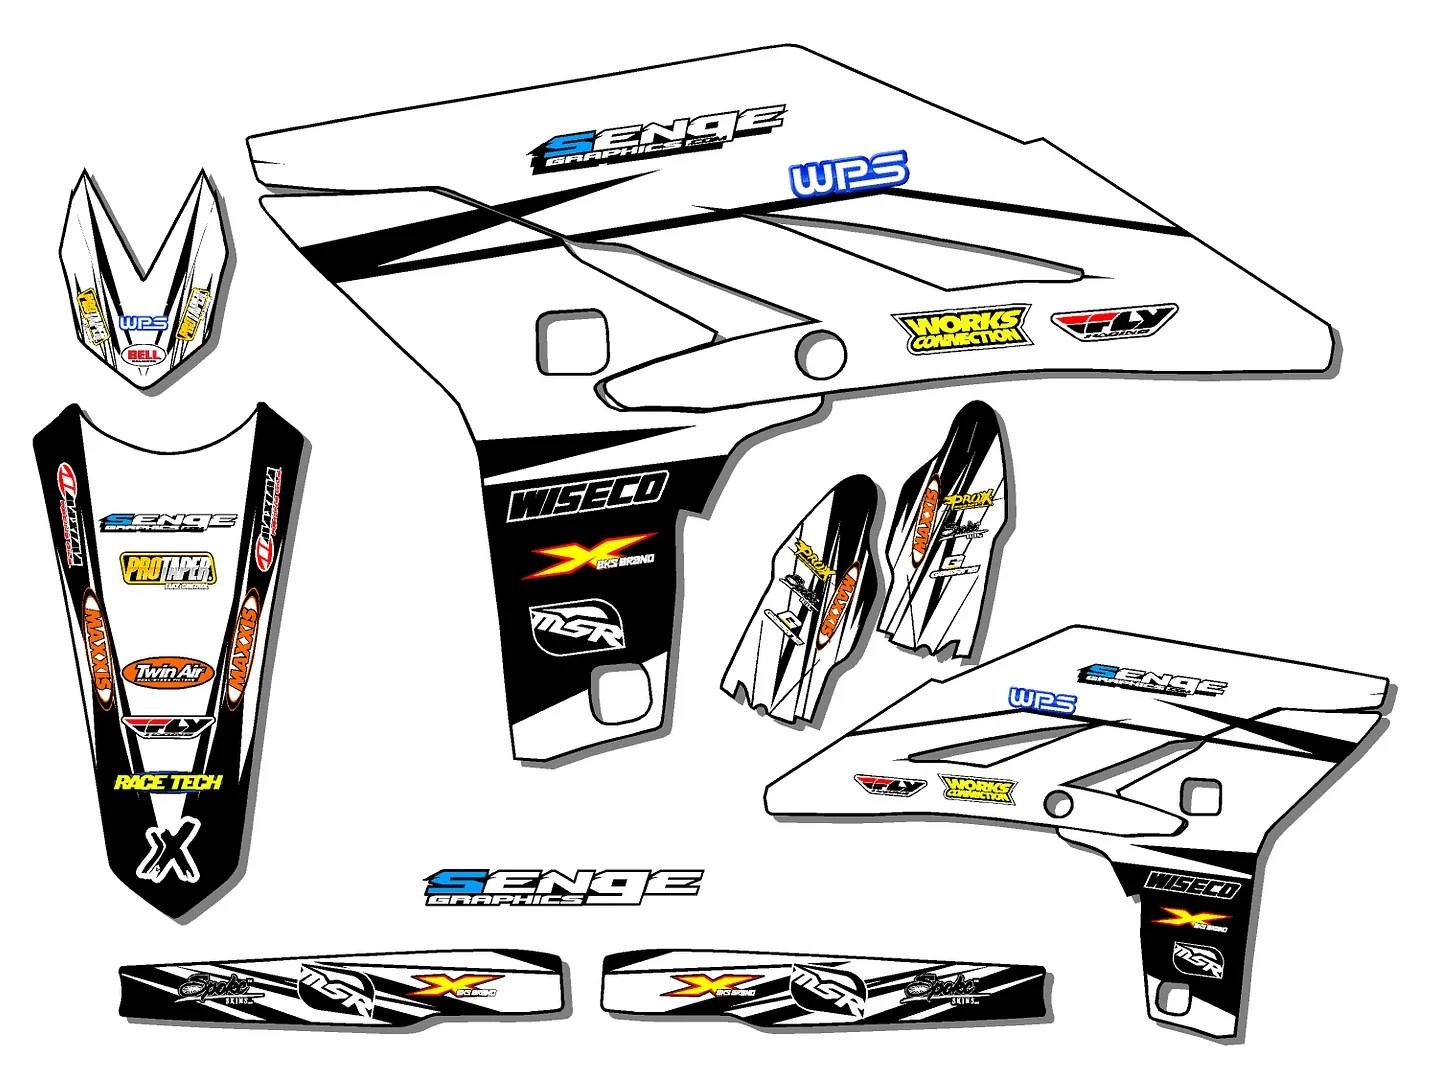 Yz 125 250 Graphics Kit Yamaha Yz125 Yz250